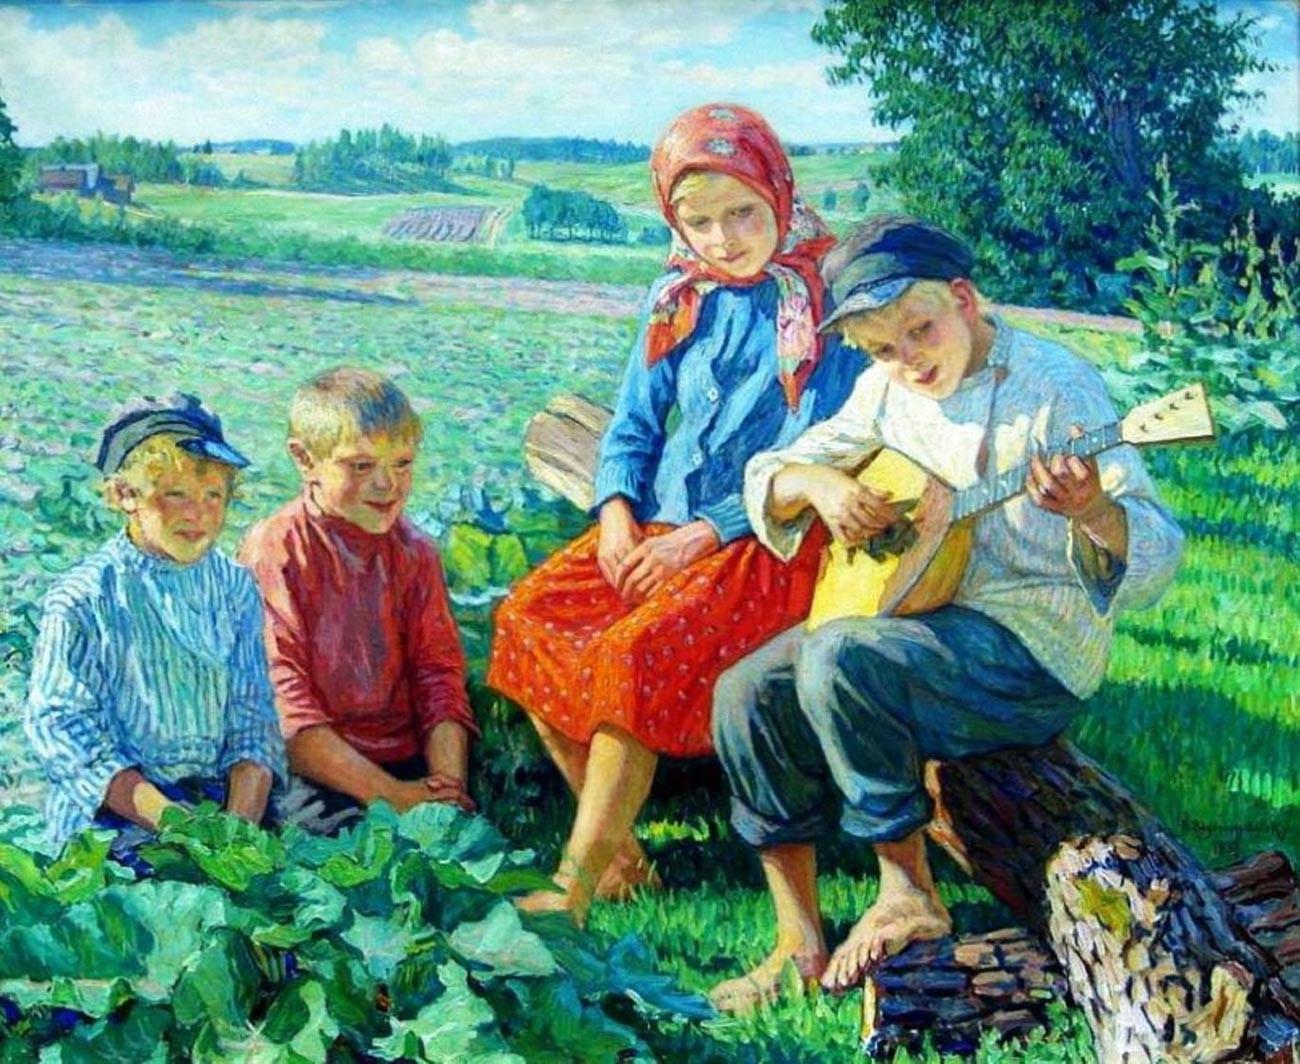 Bambini si divertono con la balalaika